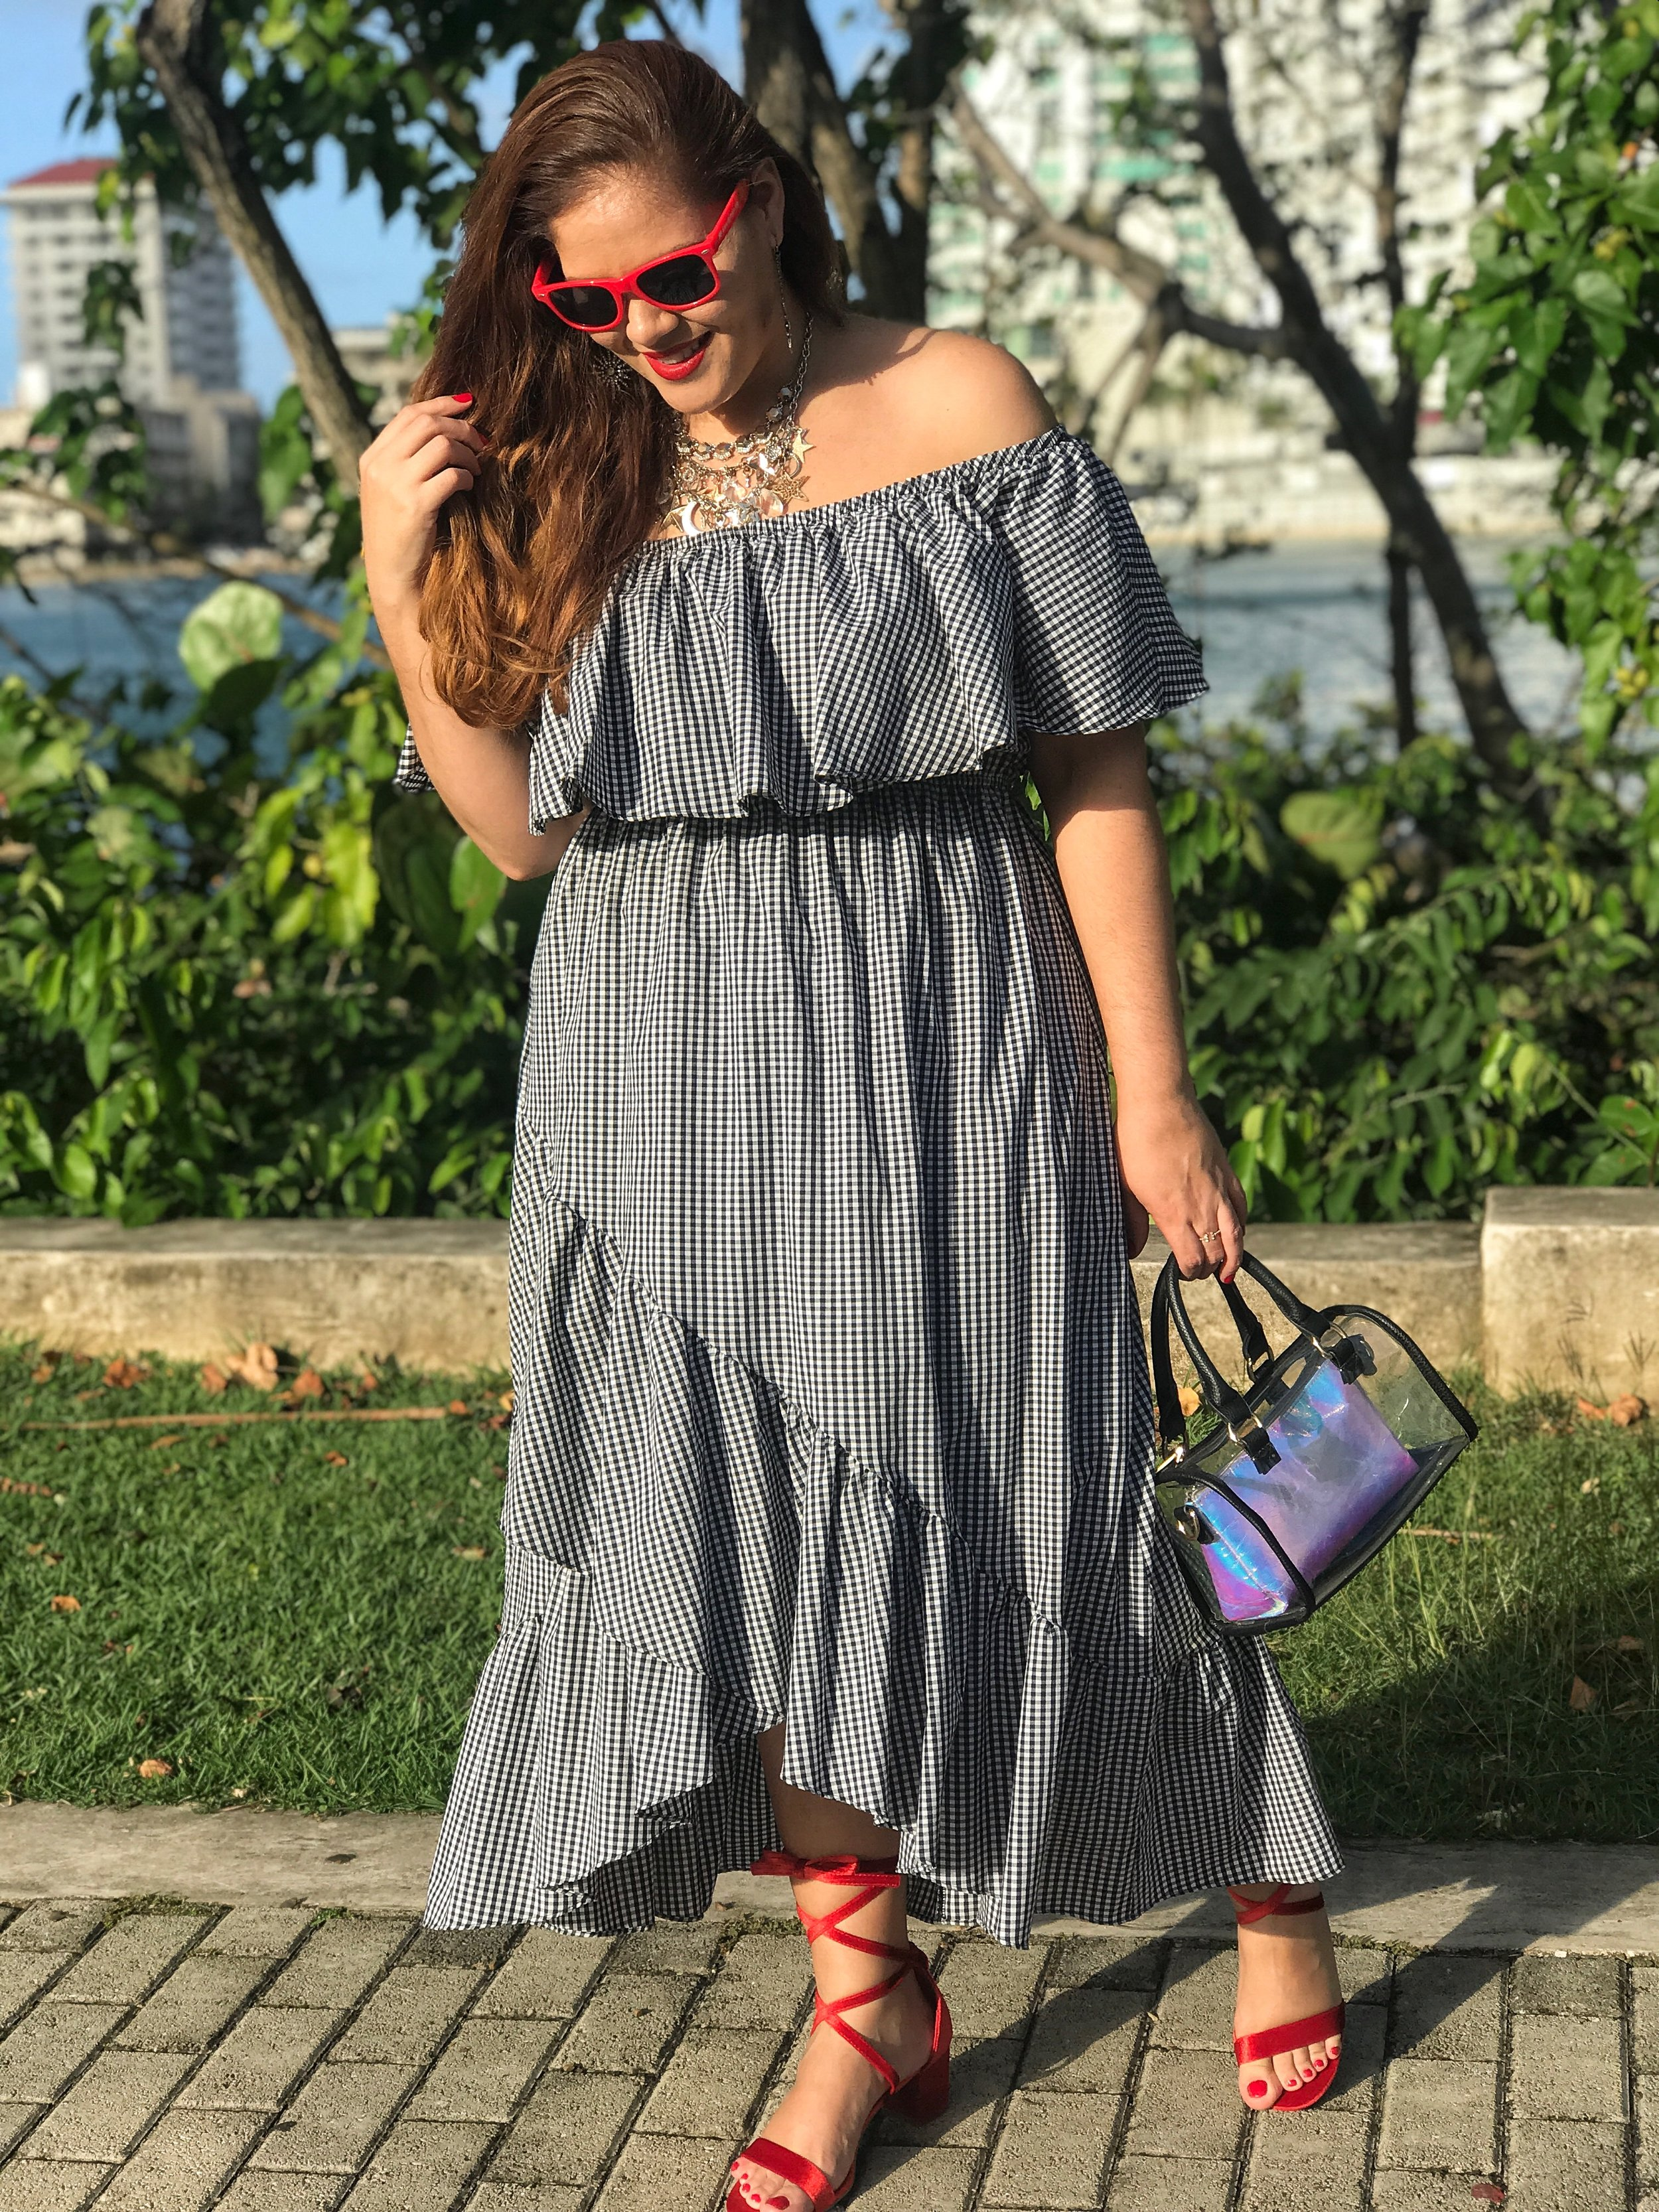 Off Shoulder Ruffled Gingham Dress  (50% Off Code: LOVEWALLET),  Red Sunglasses (Similar) ,  Star Multi Chain Necklace ,  Clear Bag (Similar) ,  Velvet Red Lace-Up Sandals